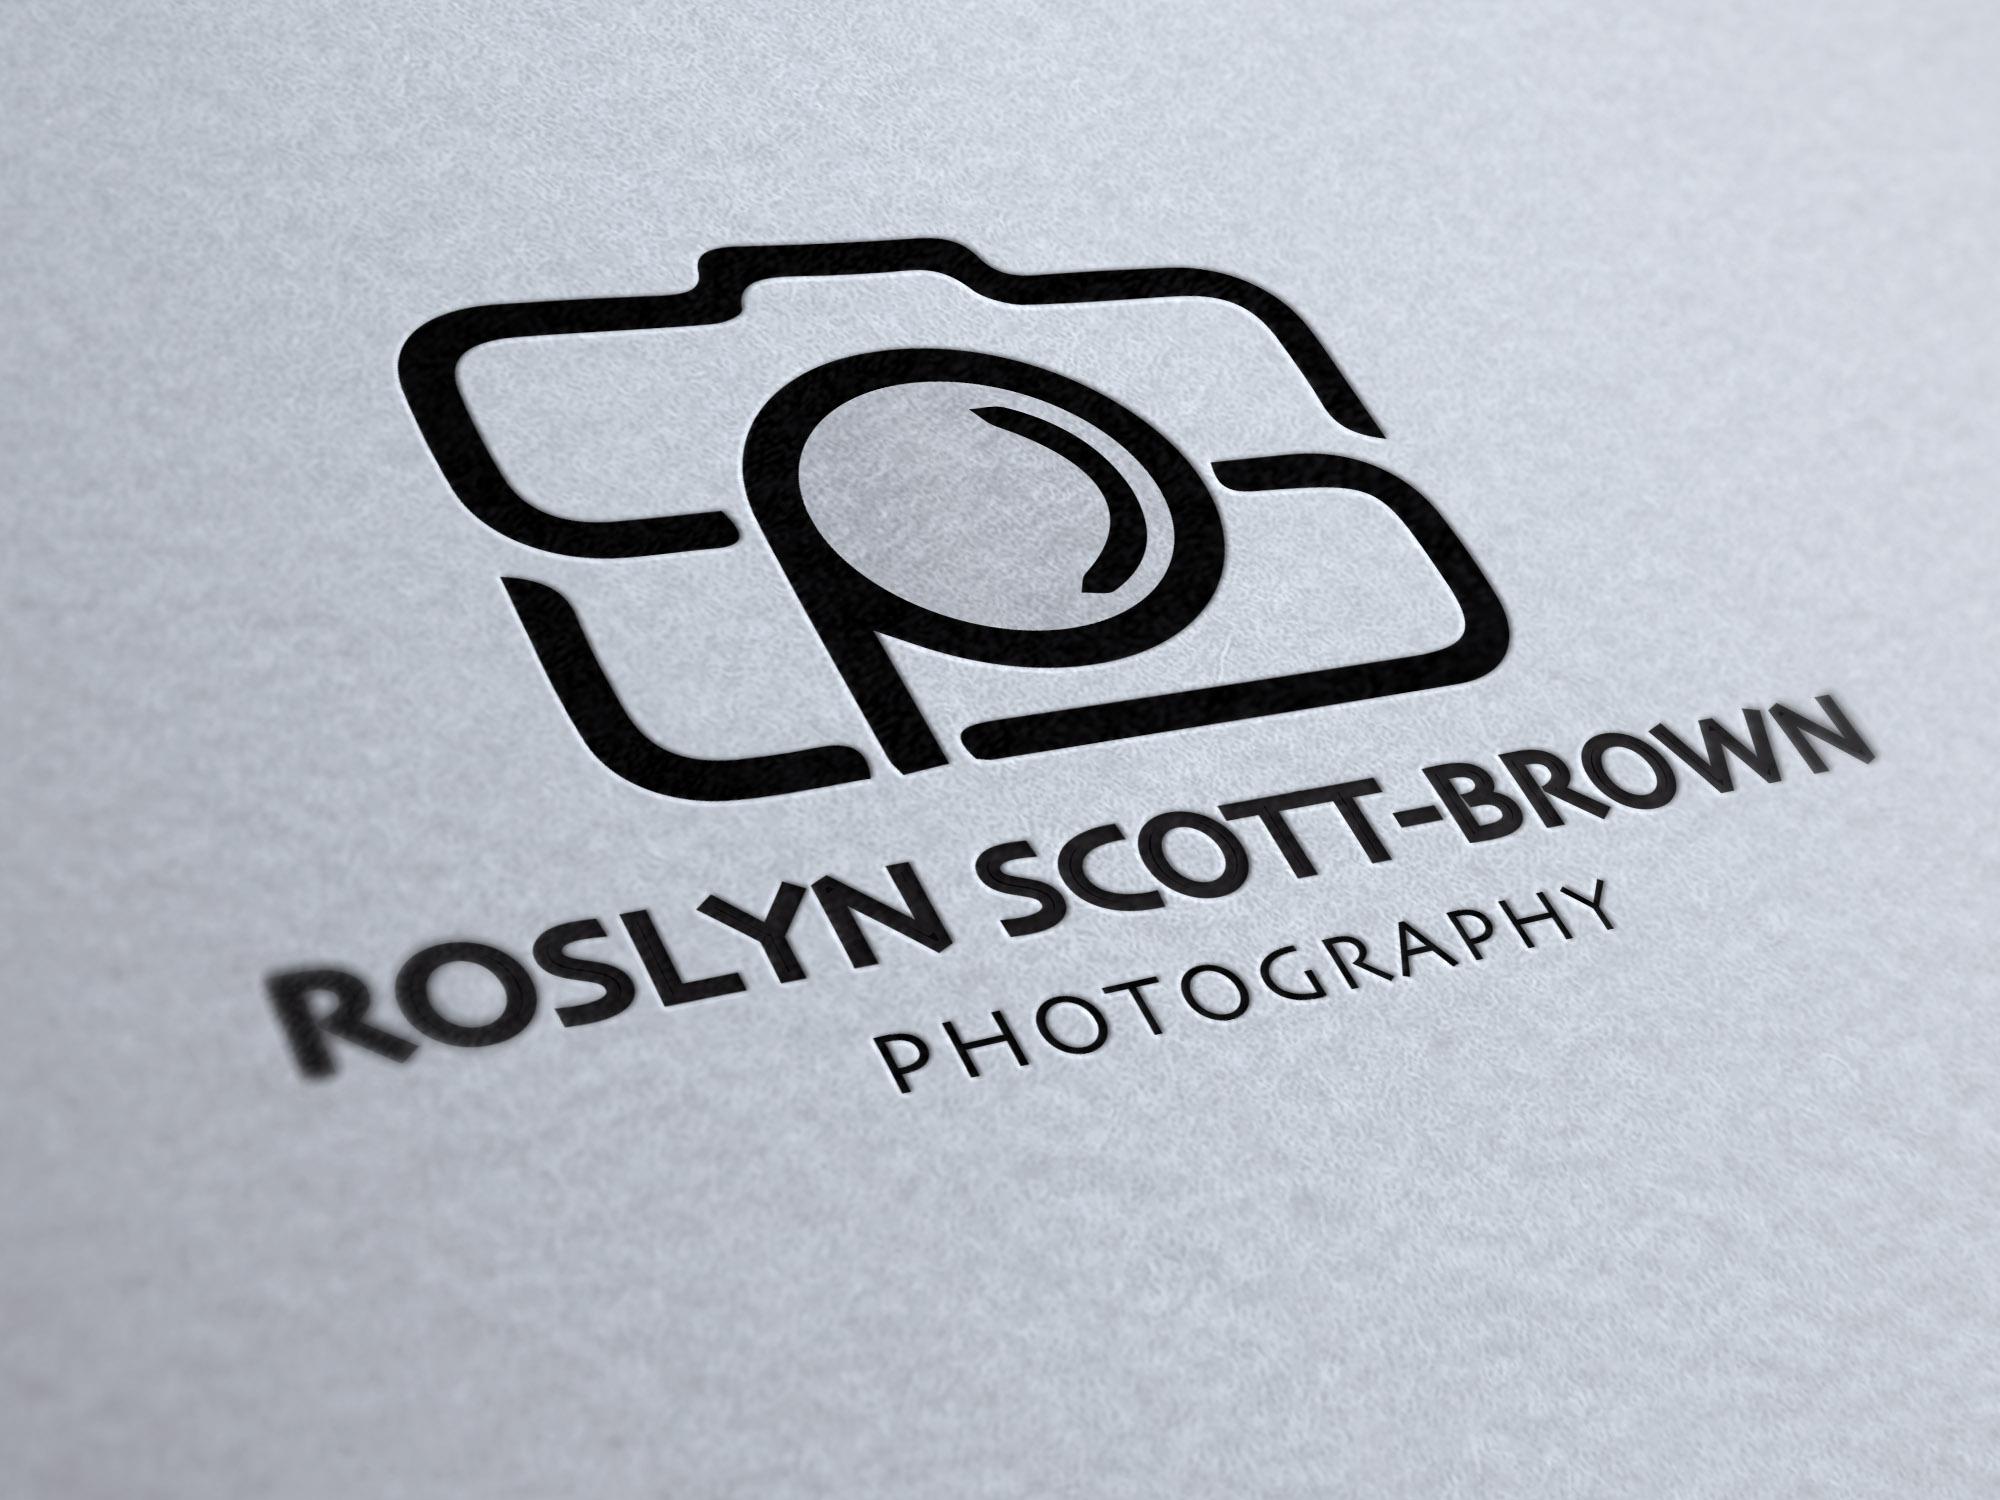 RSB Photo